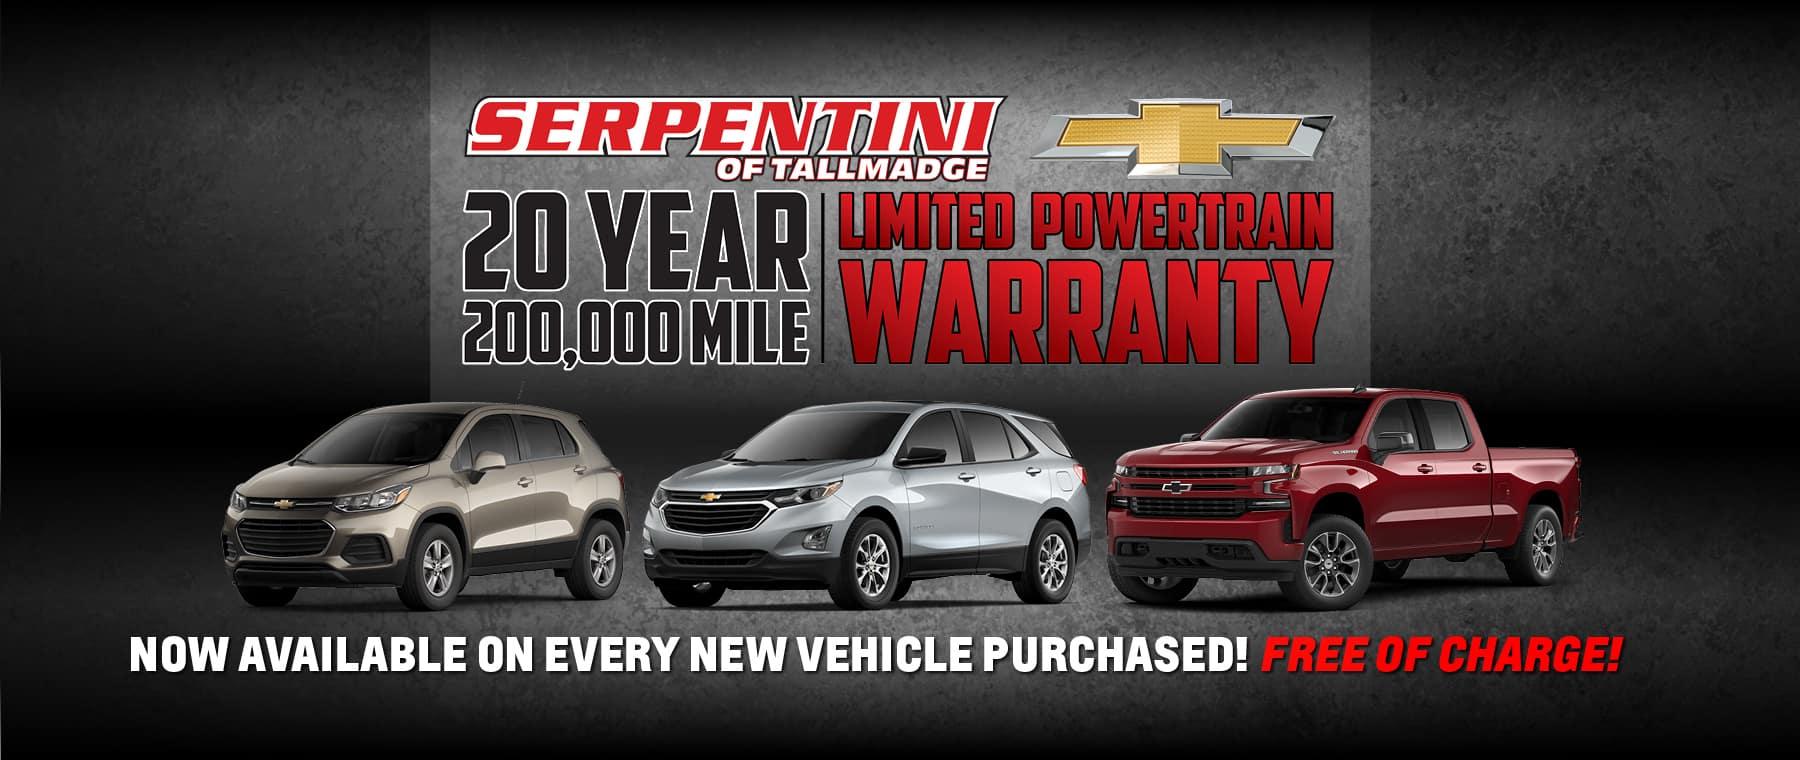 New Chevrolet Dealer In Tallmadge Serpentini Chevrolet